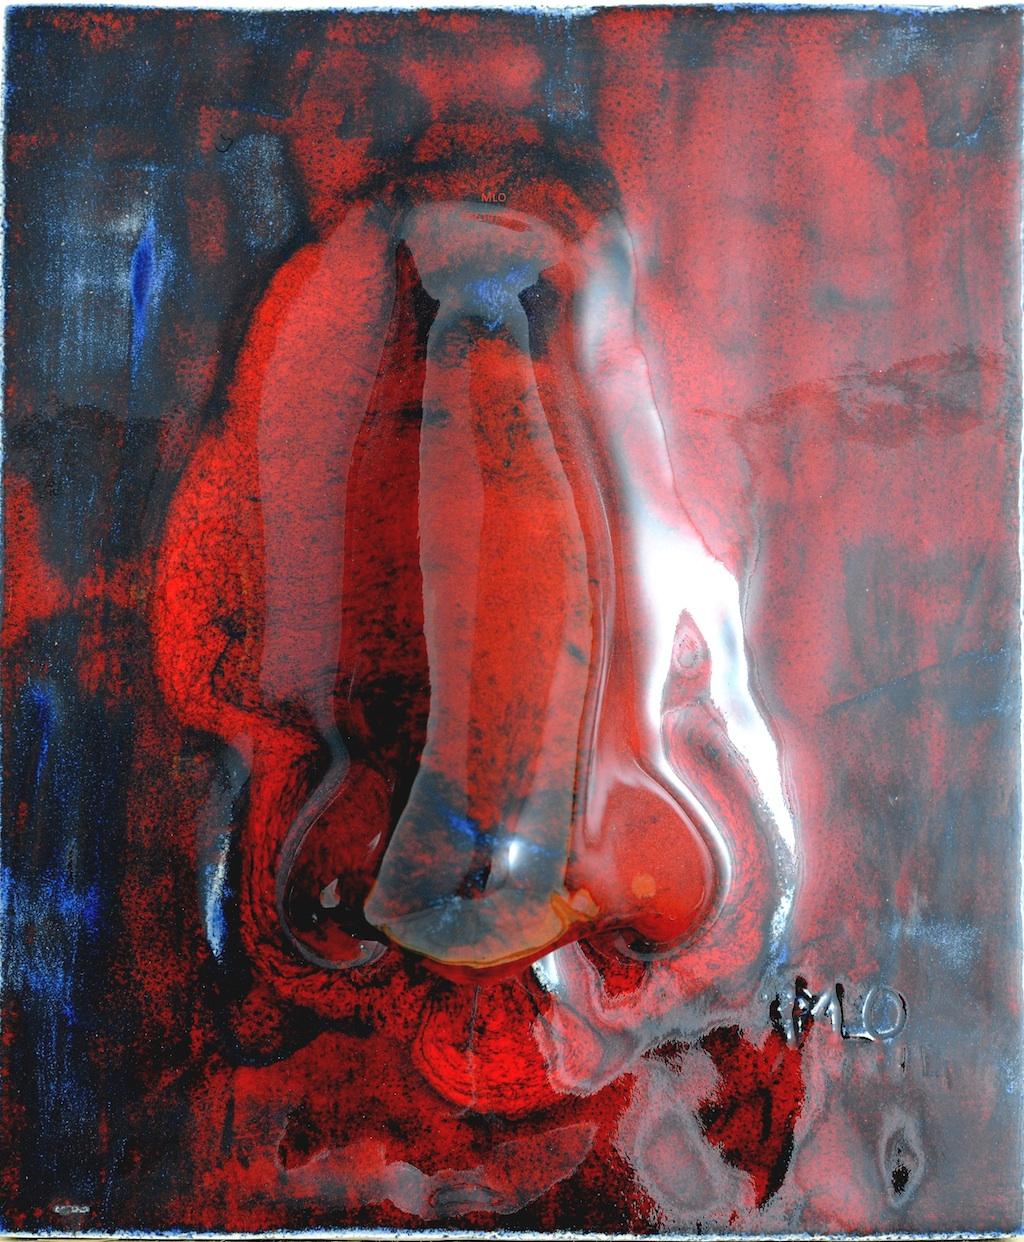 Anne Millot Spanish Hunk inspire de Javier Bardem M 72 dpi (1)